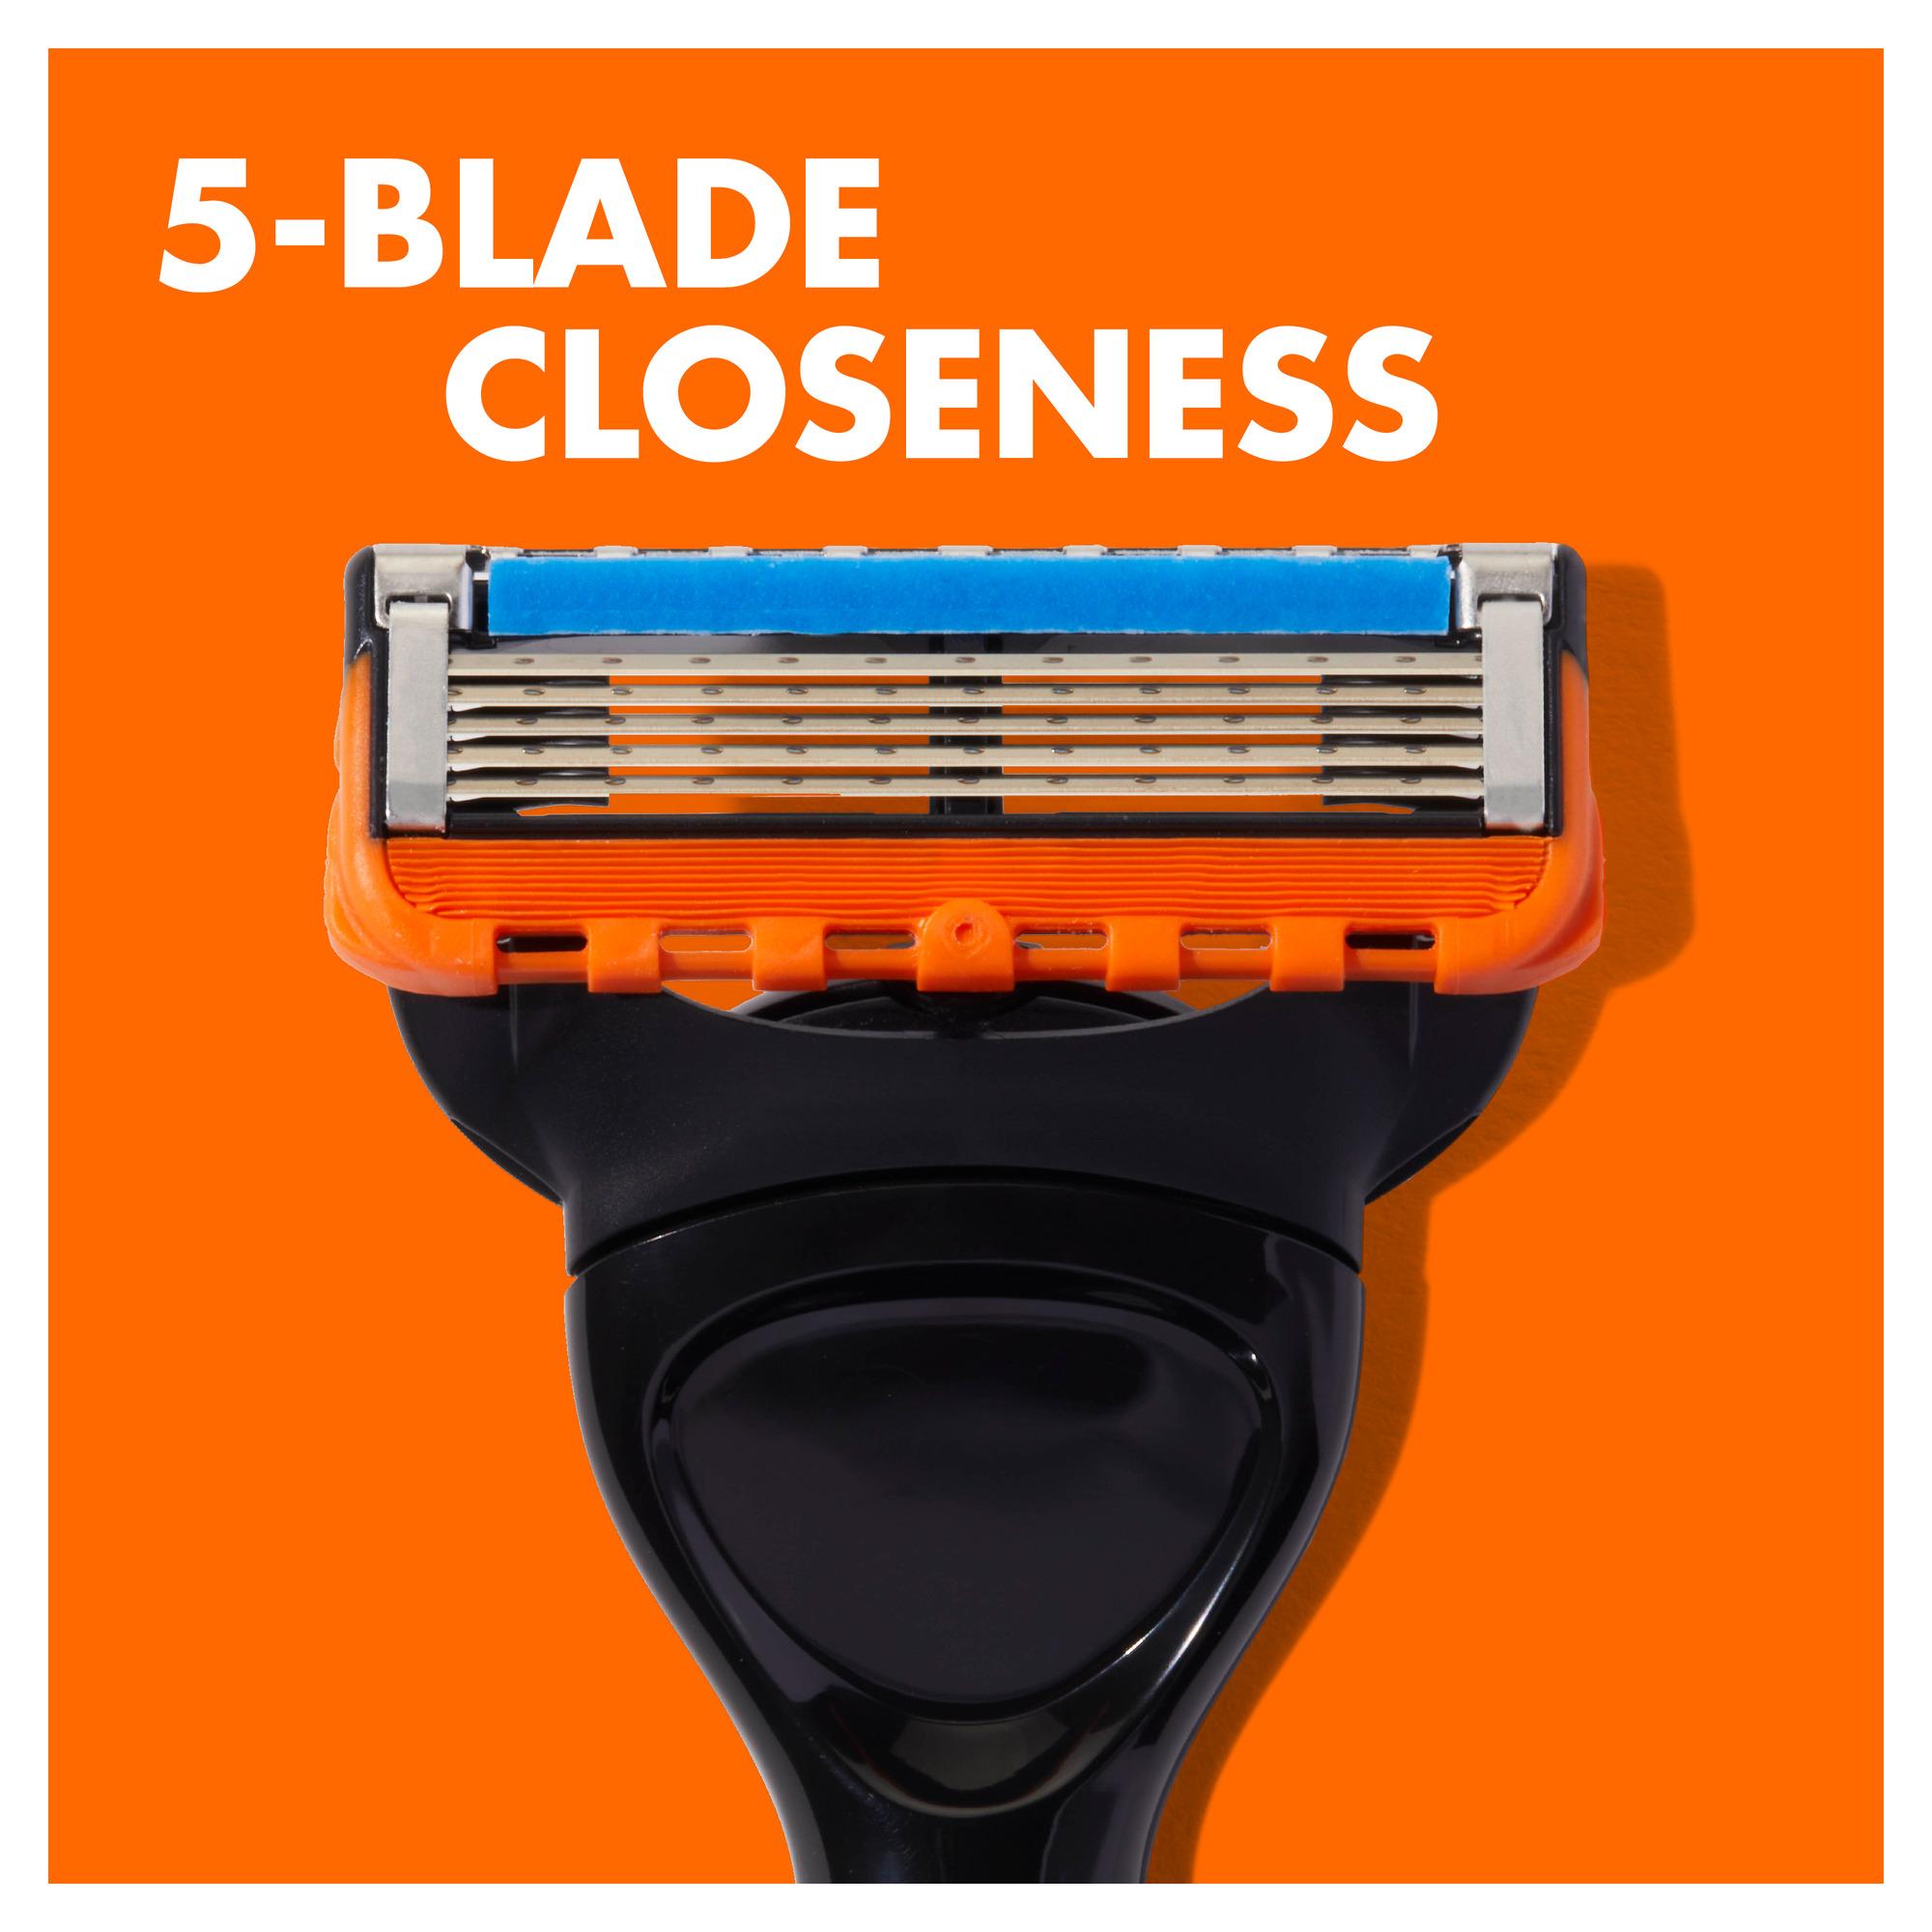 5 blades of closeness